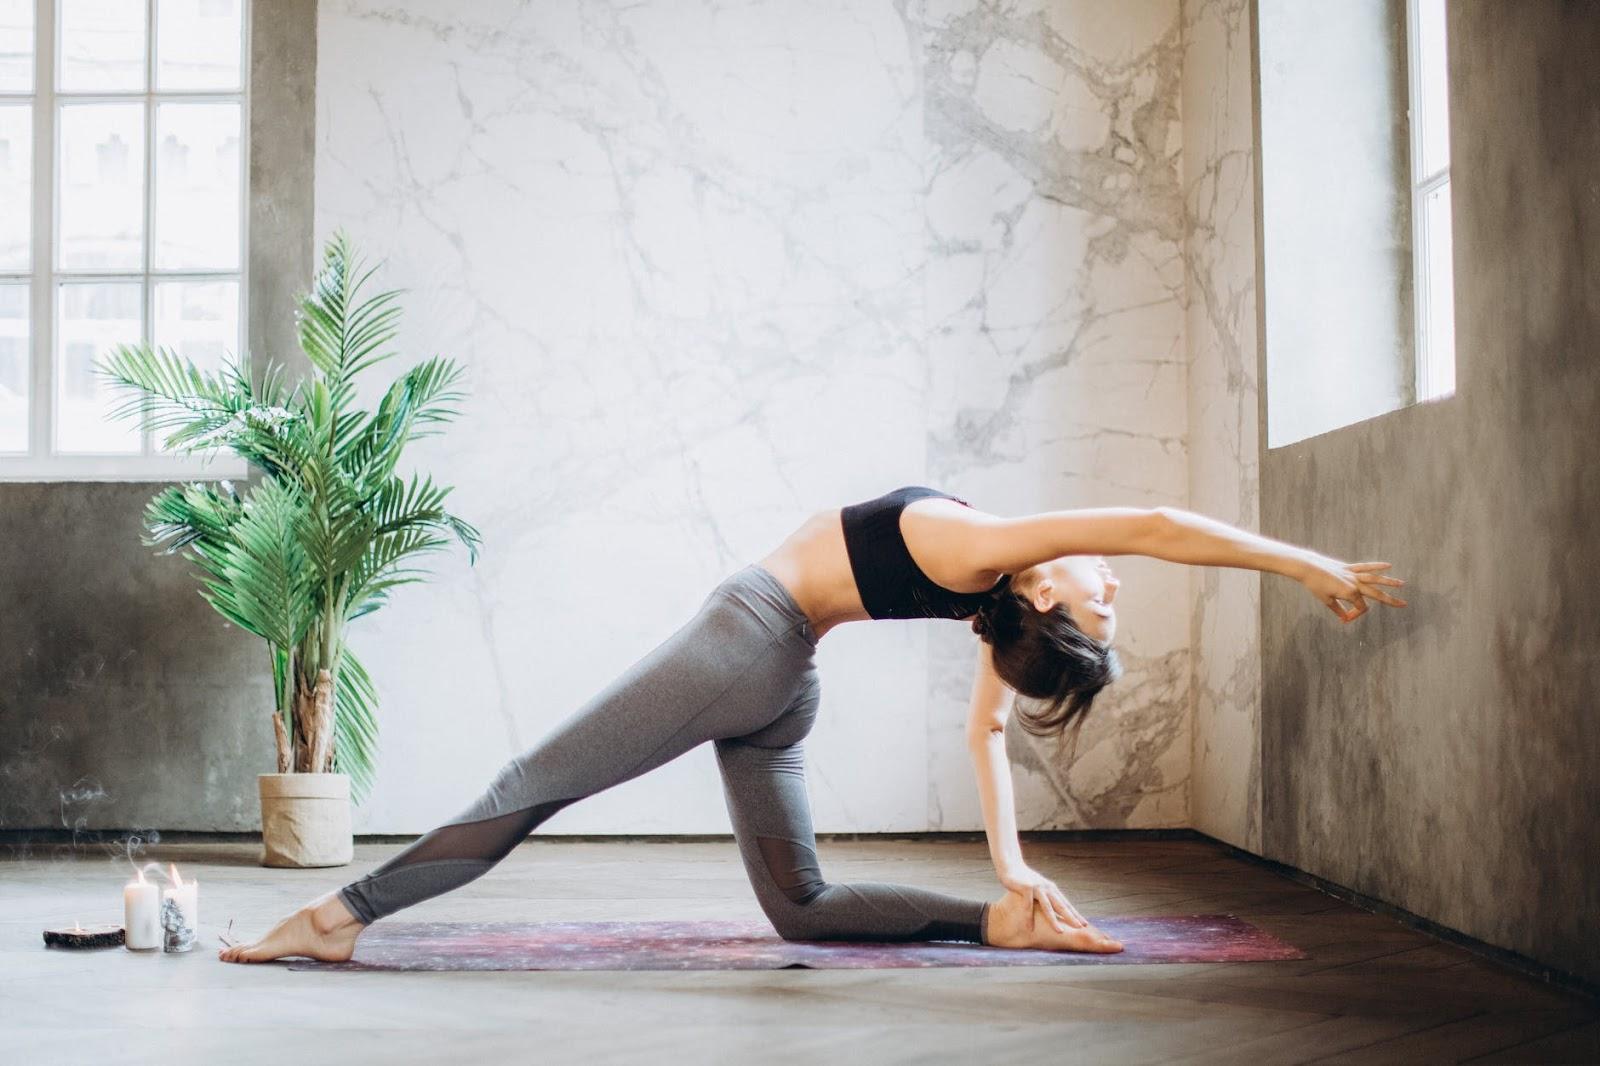 Lady practicing yoga